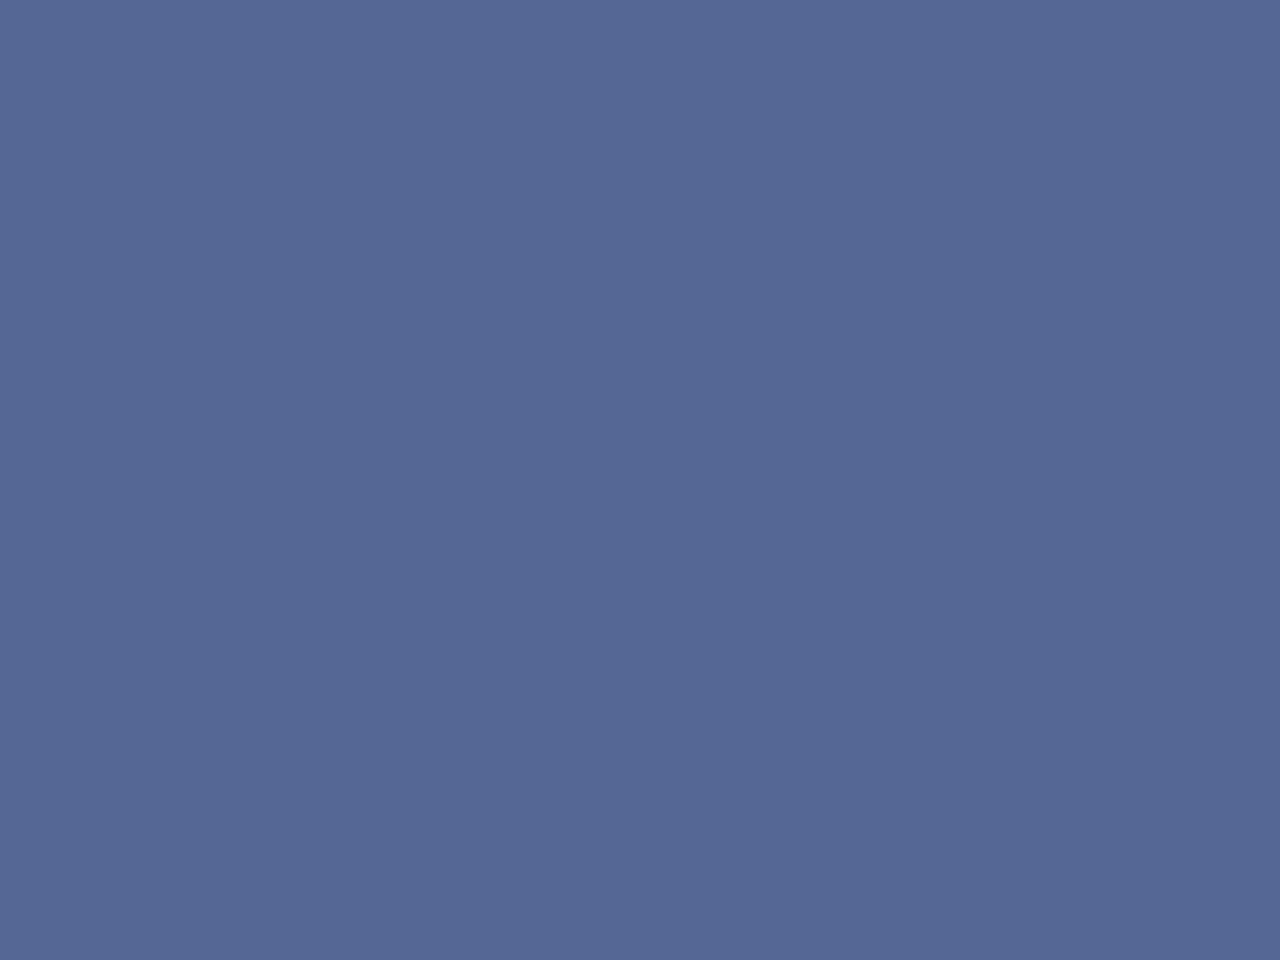 1280x960 UCLA Blue Solid Color Background